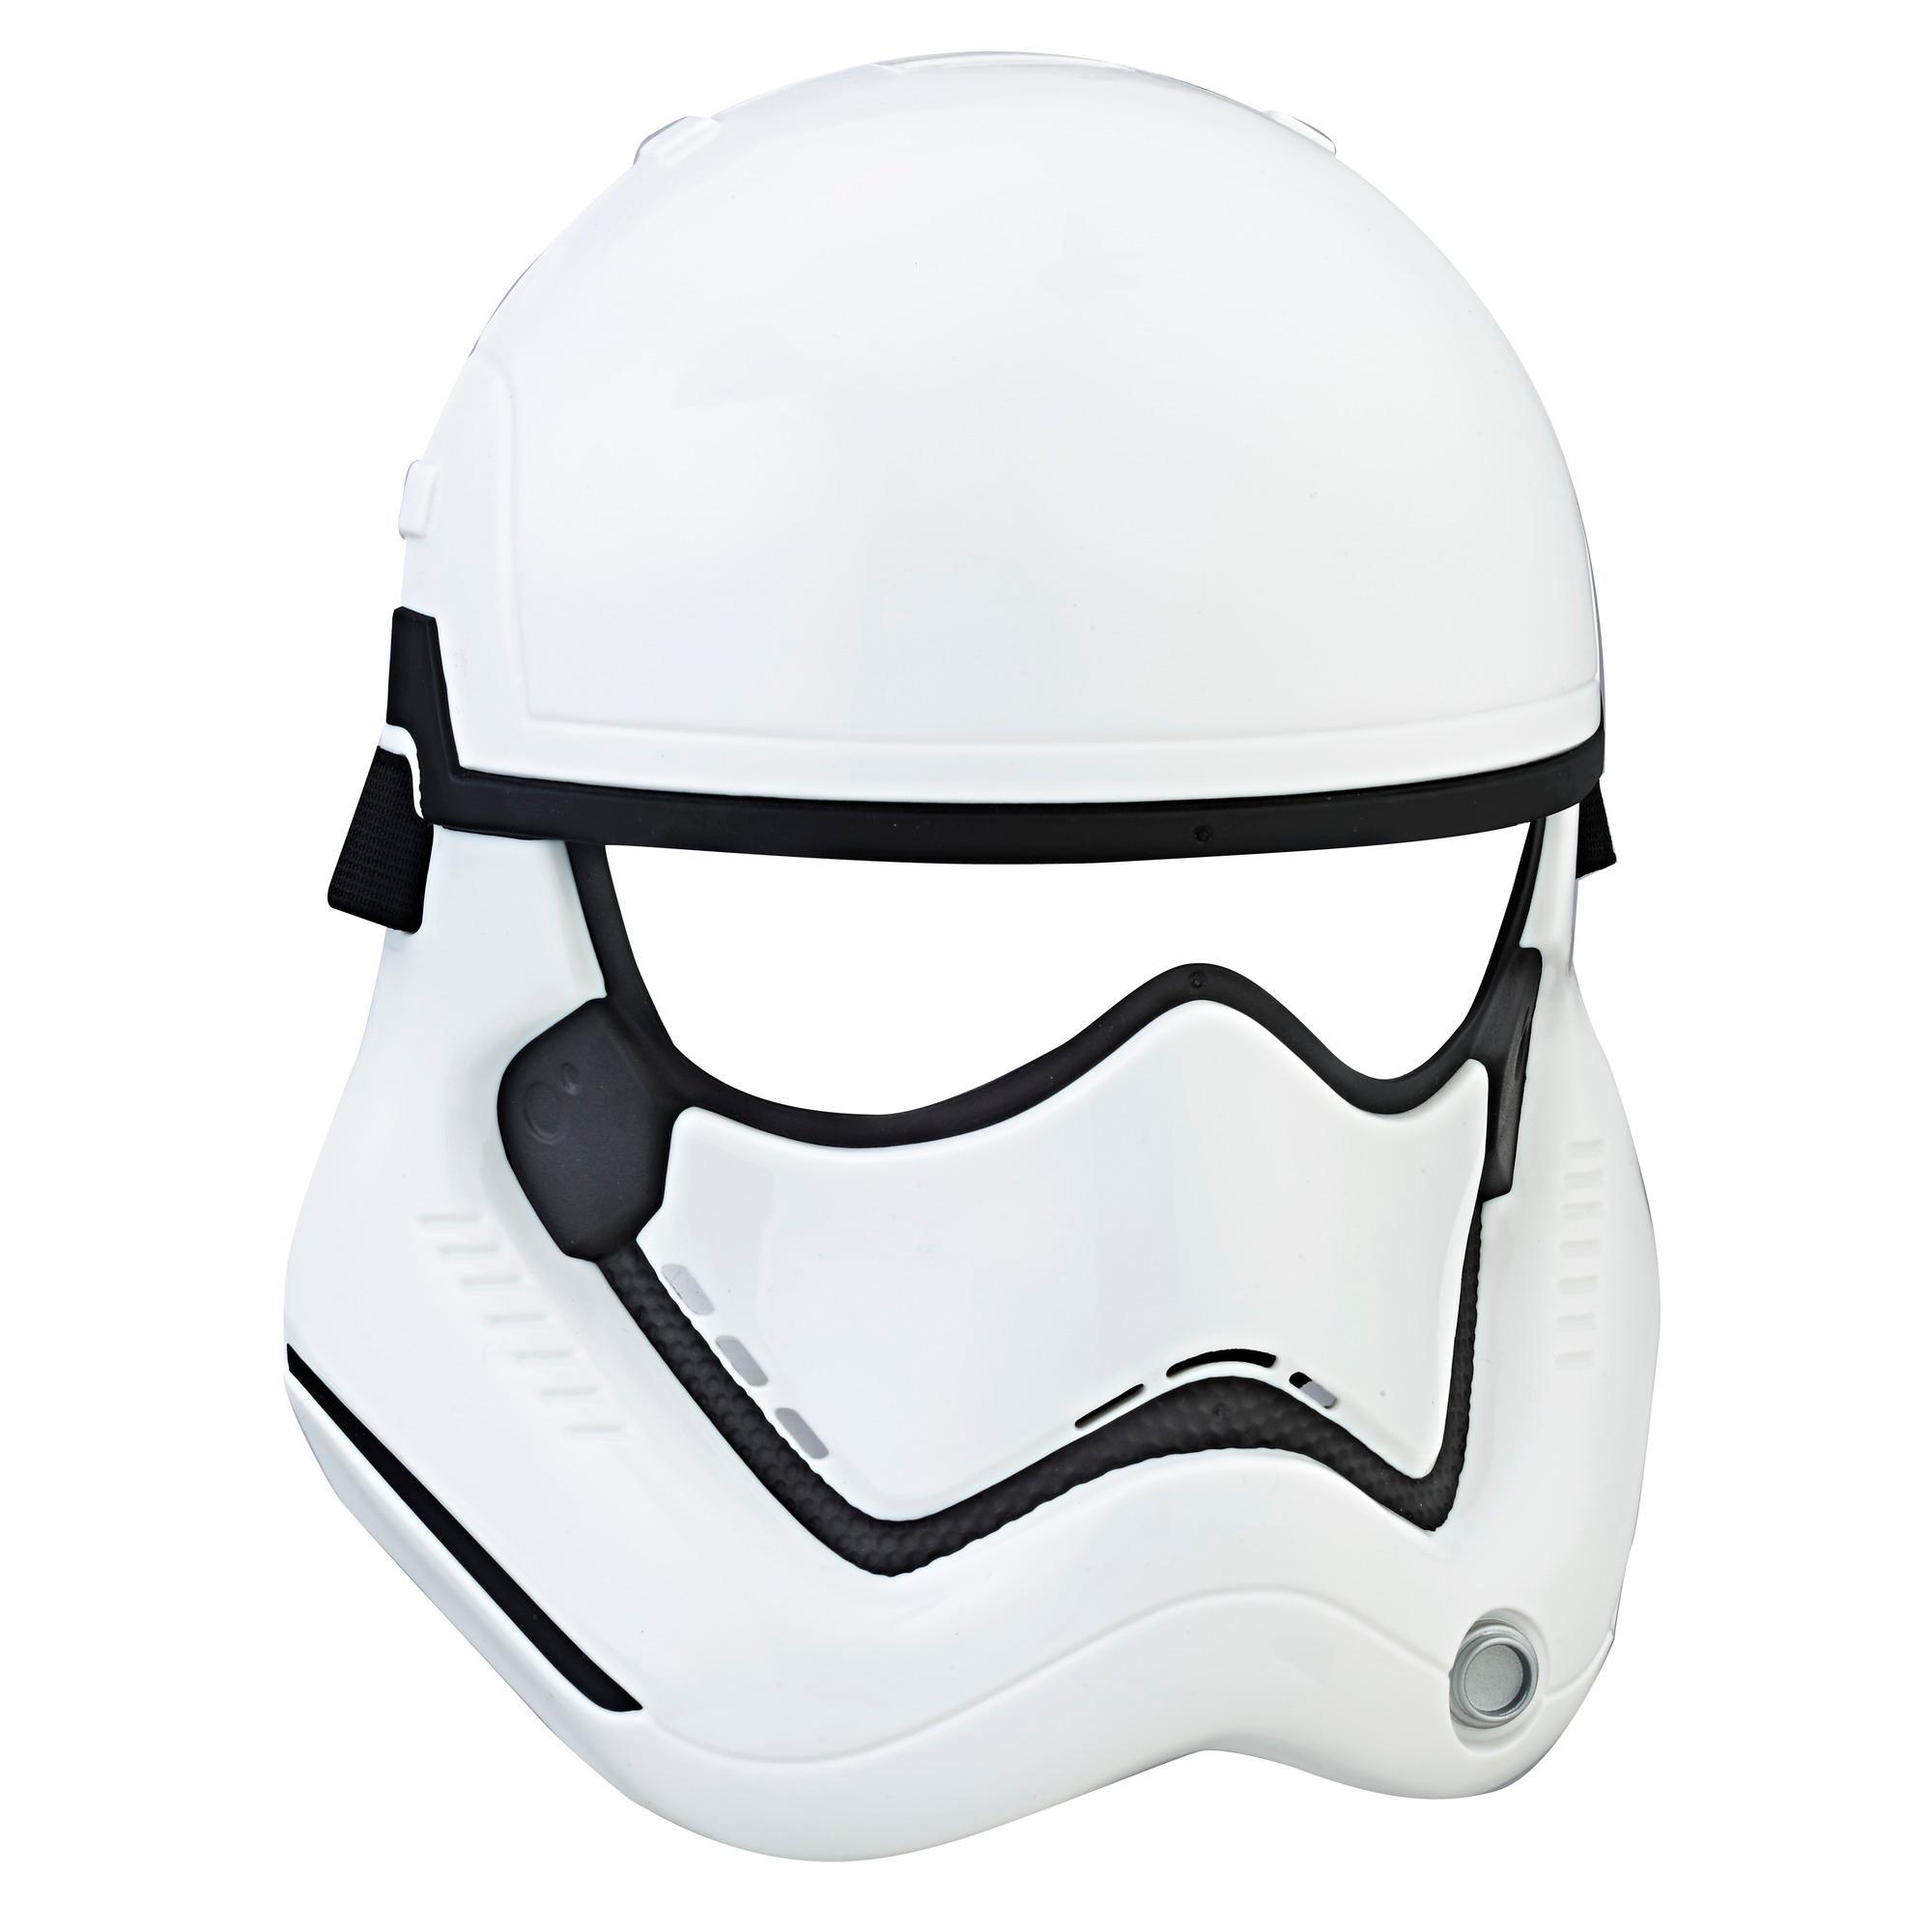 Star Wars: The Last Jedi First Order Stormtrooper Mask